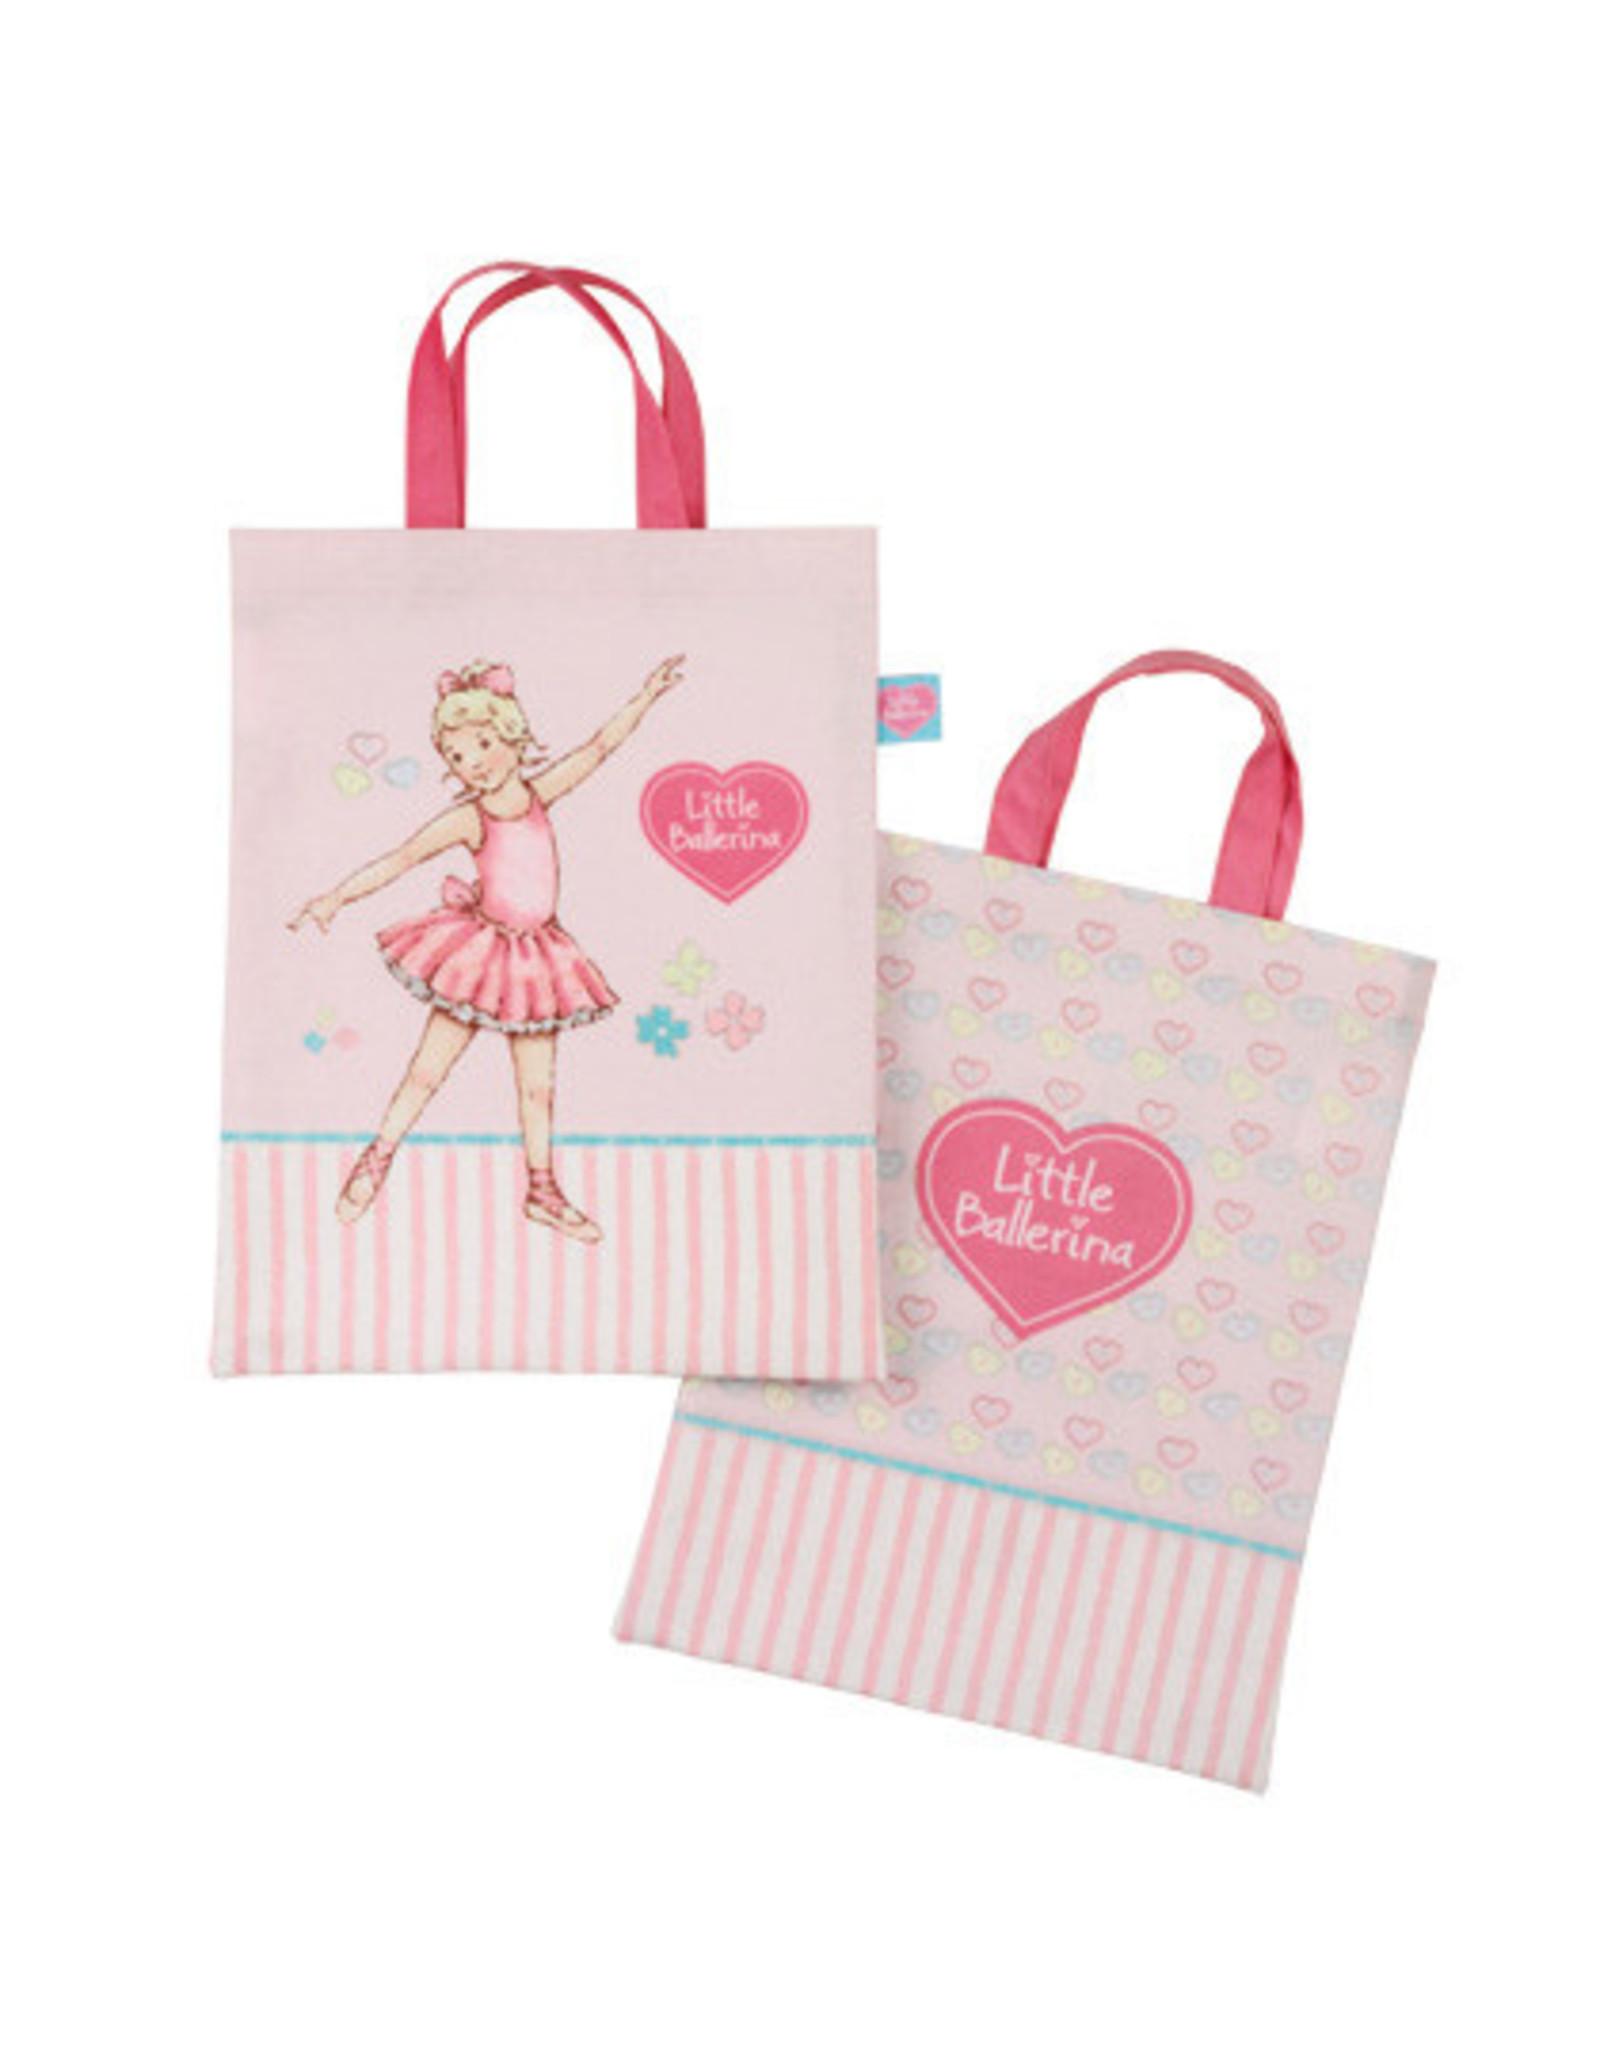 Little Ballerina Little Ballerina Small Tote Bag